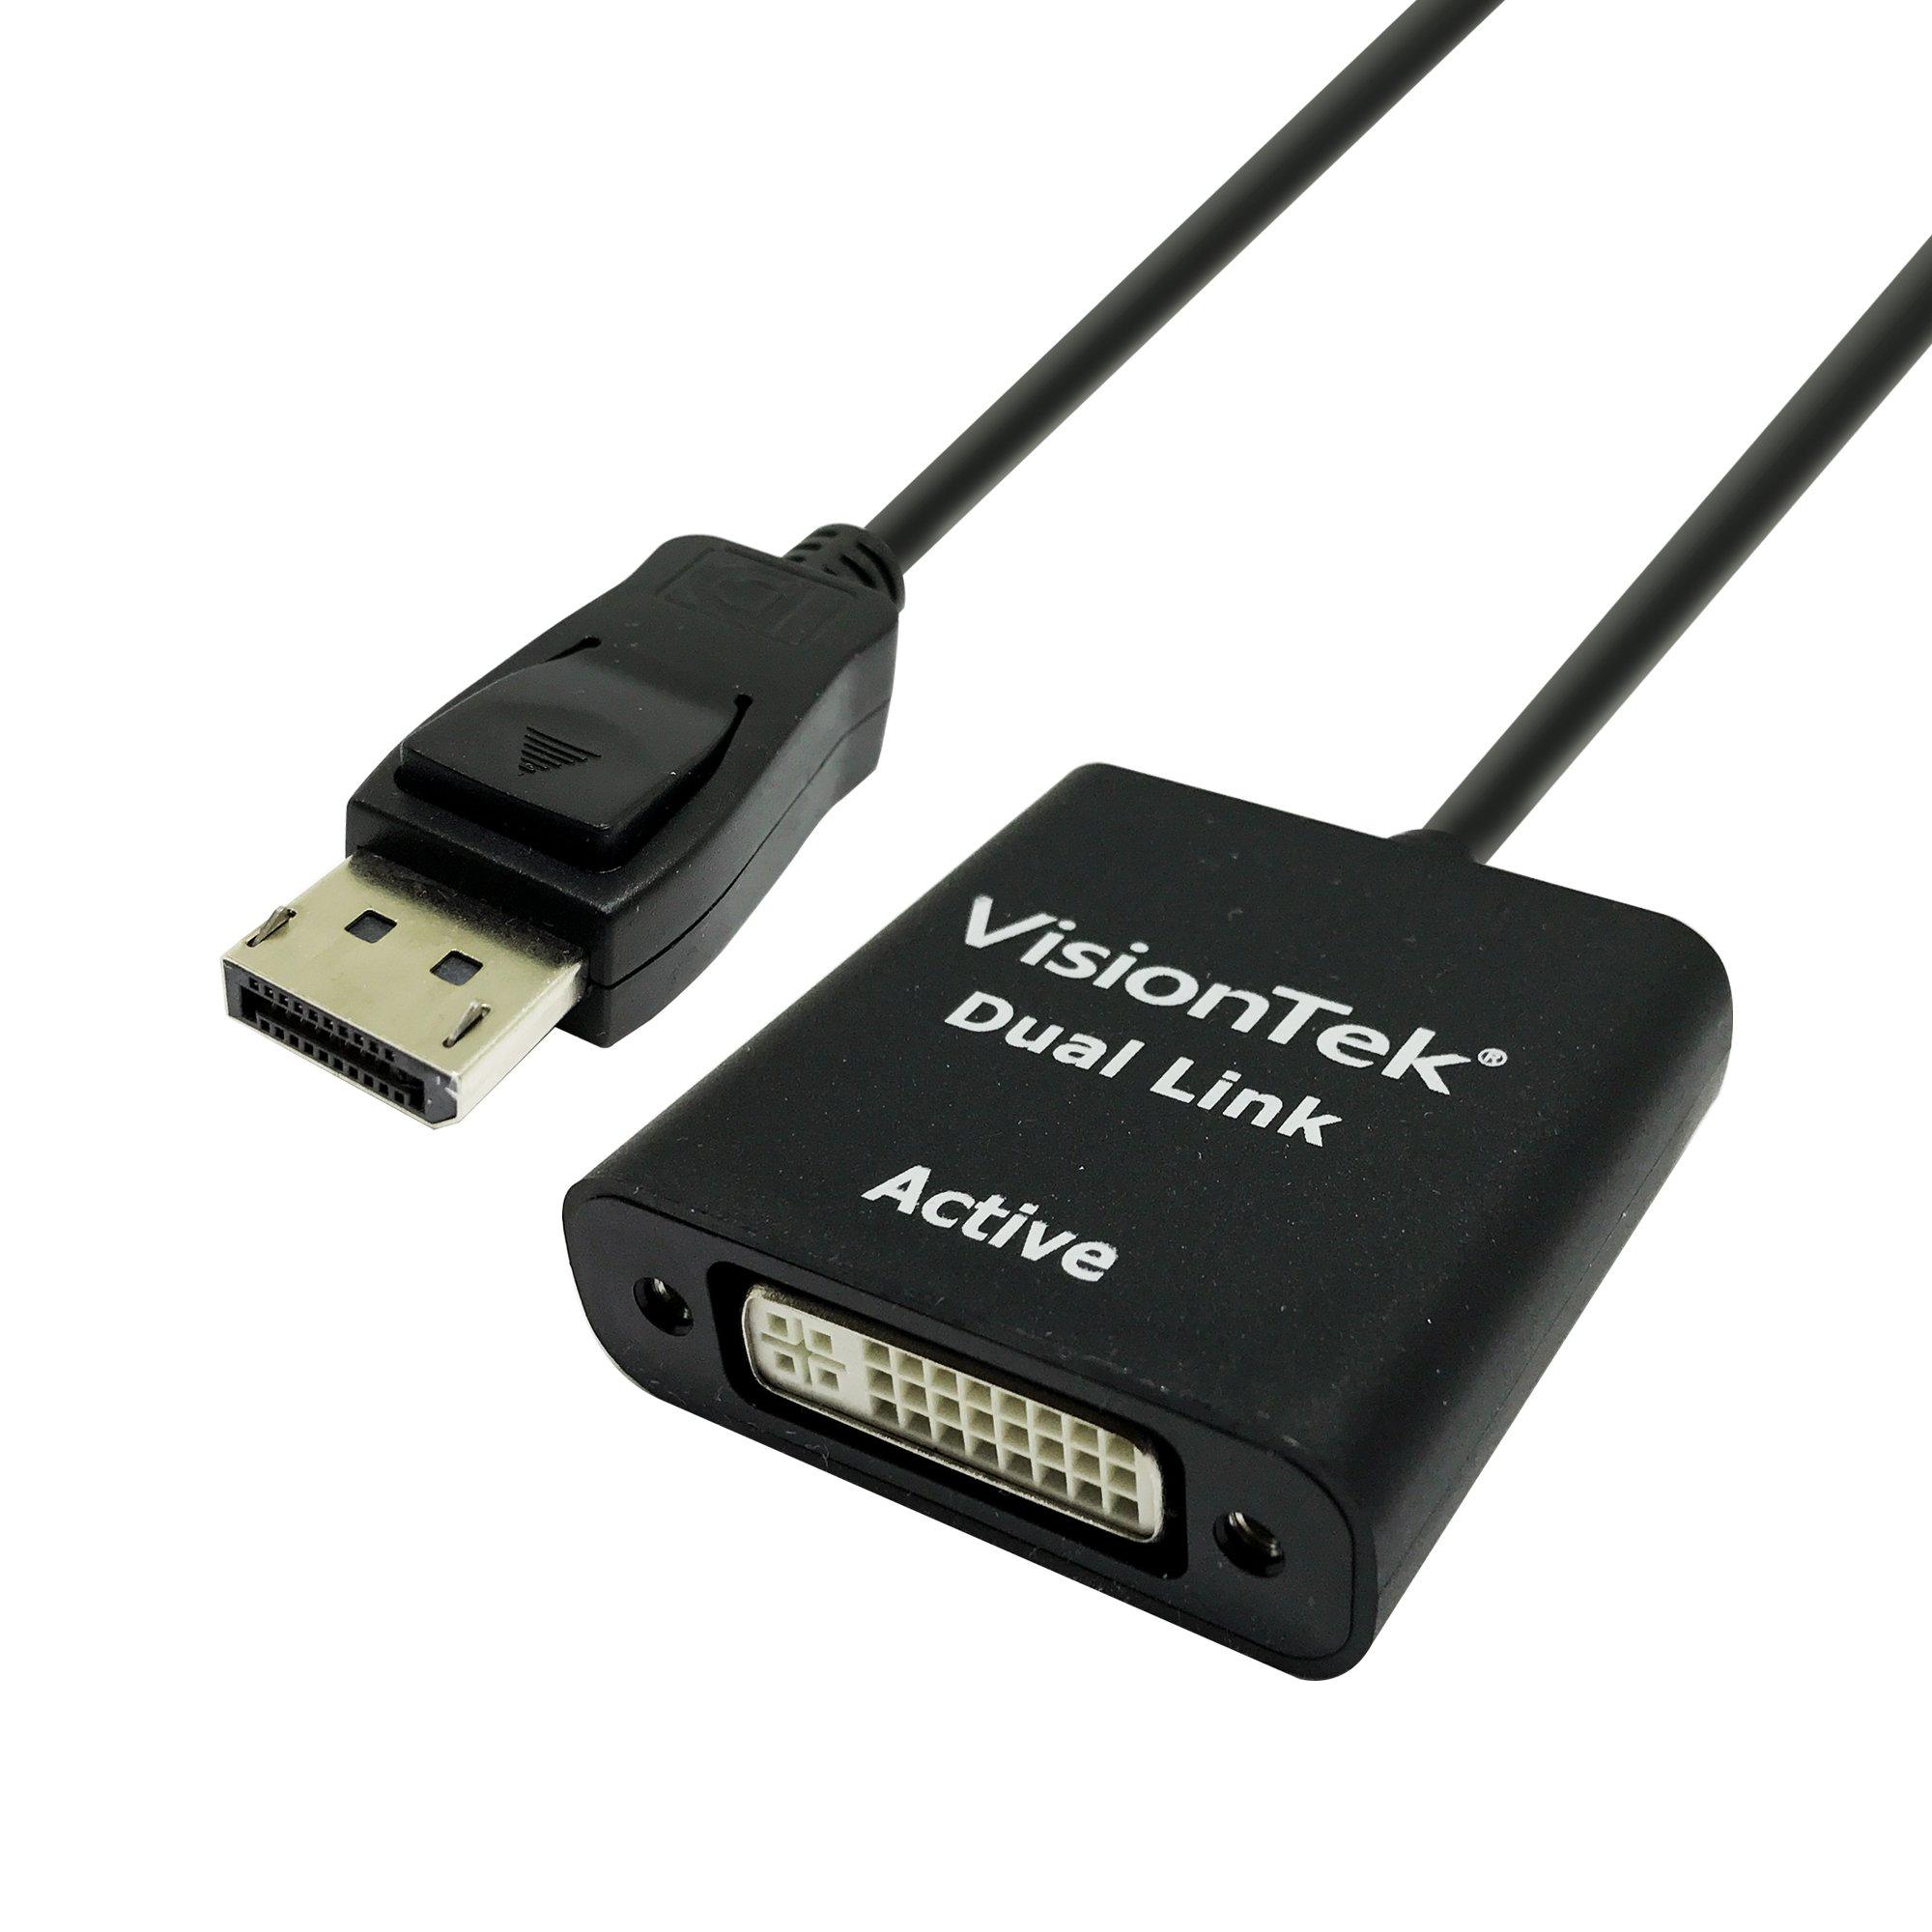 VisionTek DisplayPort to Dual Link DVI-D Active Adapter (M/F) - 900639 by VisionTek Products